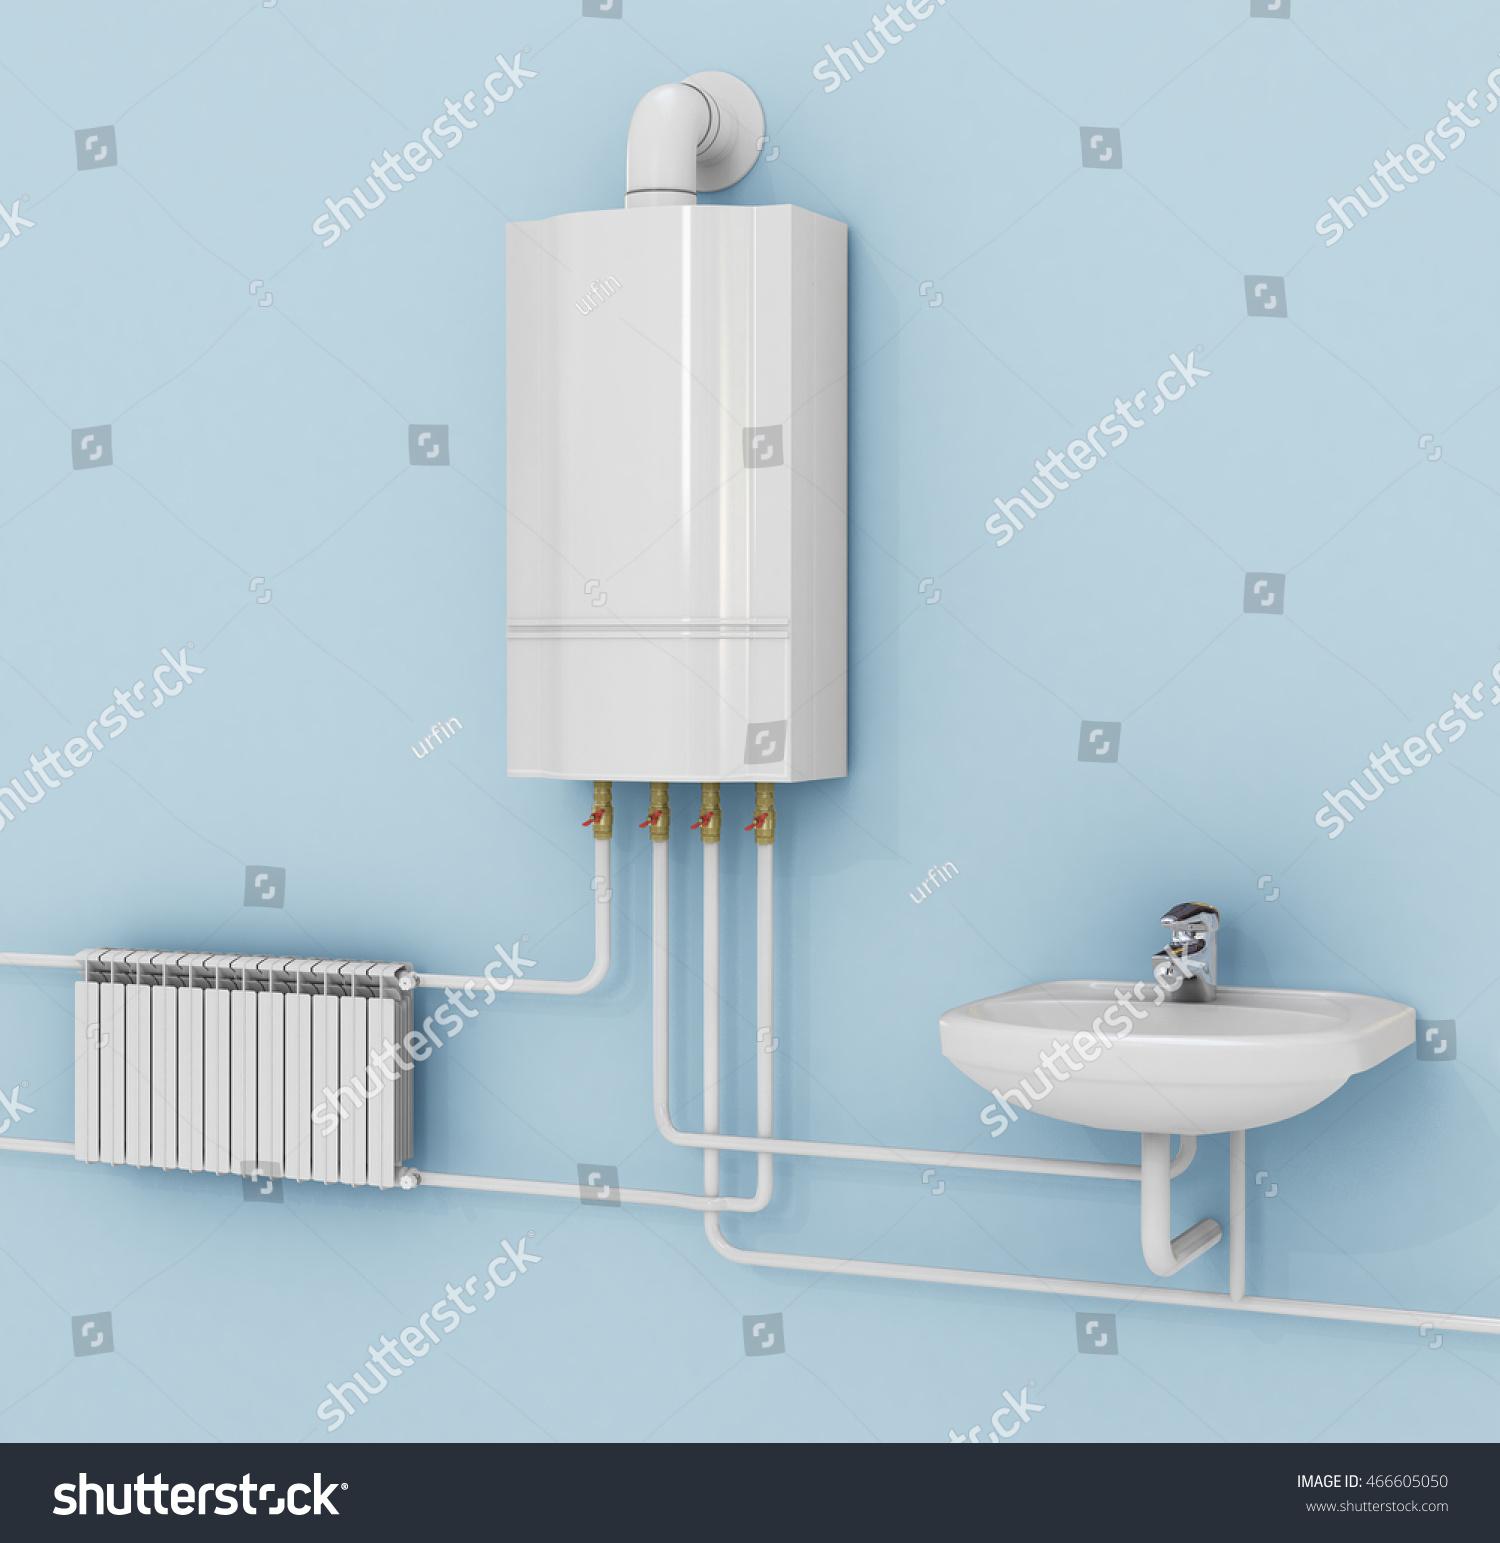 Energysaving Heating System Thermostats Smart House Stock ...